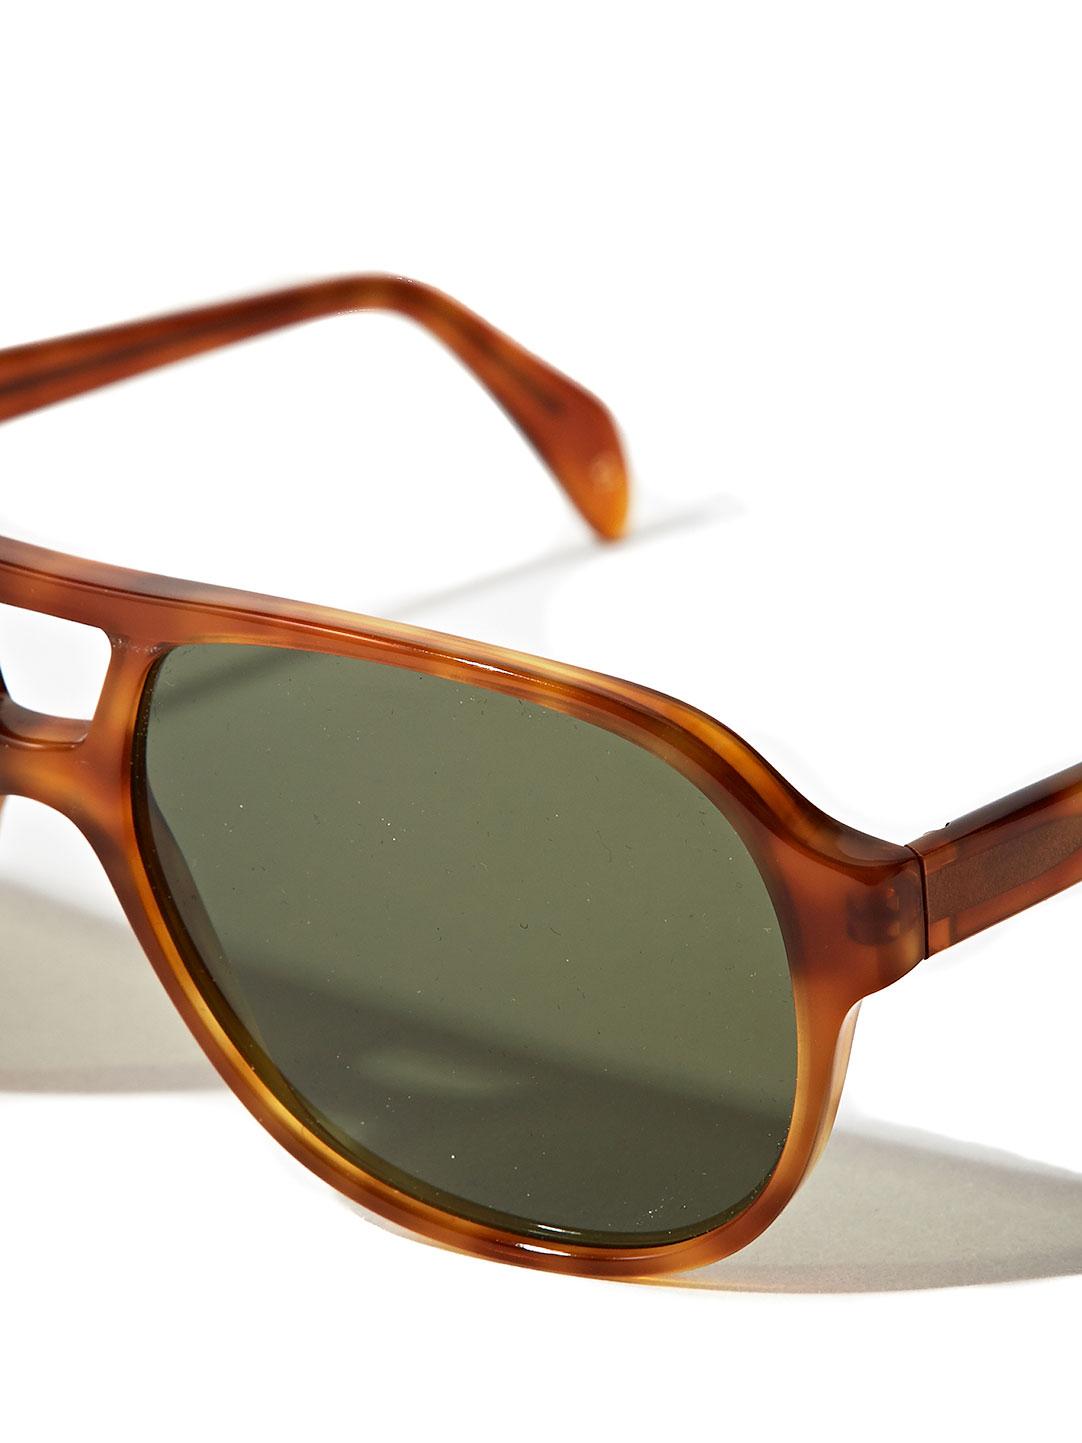 Lgr Massawa G15 Sunglasses in Brown for Men